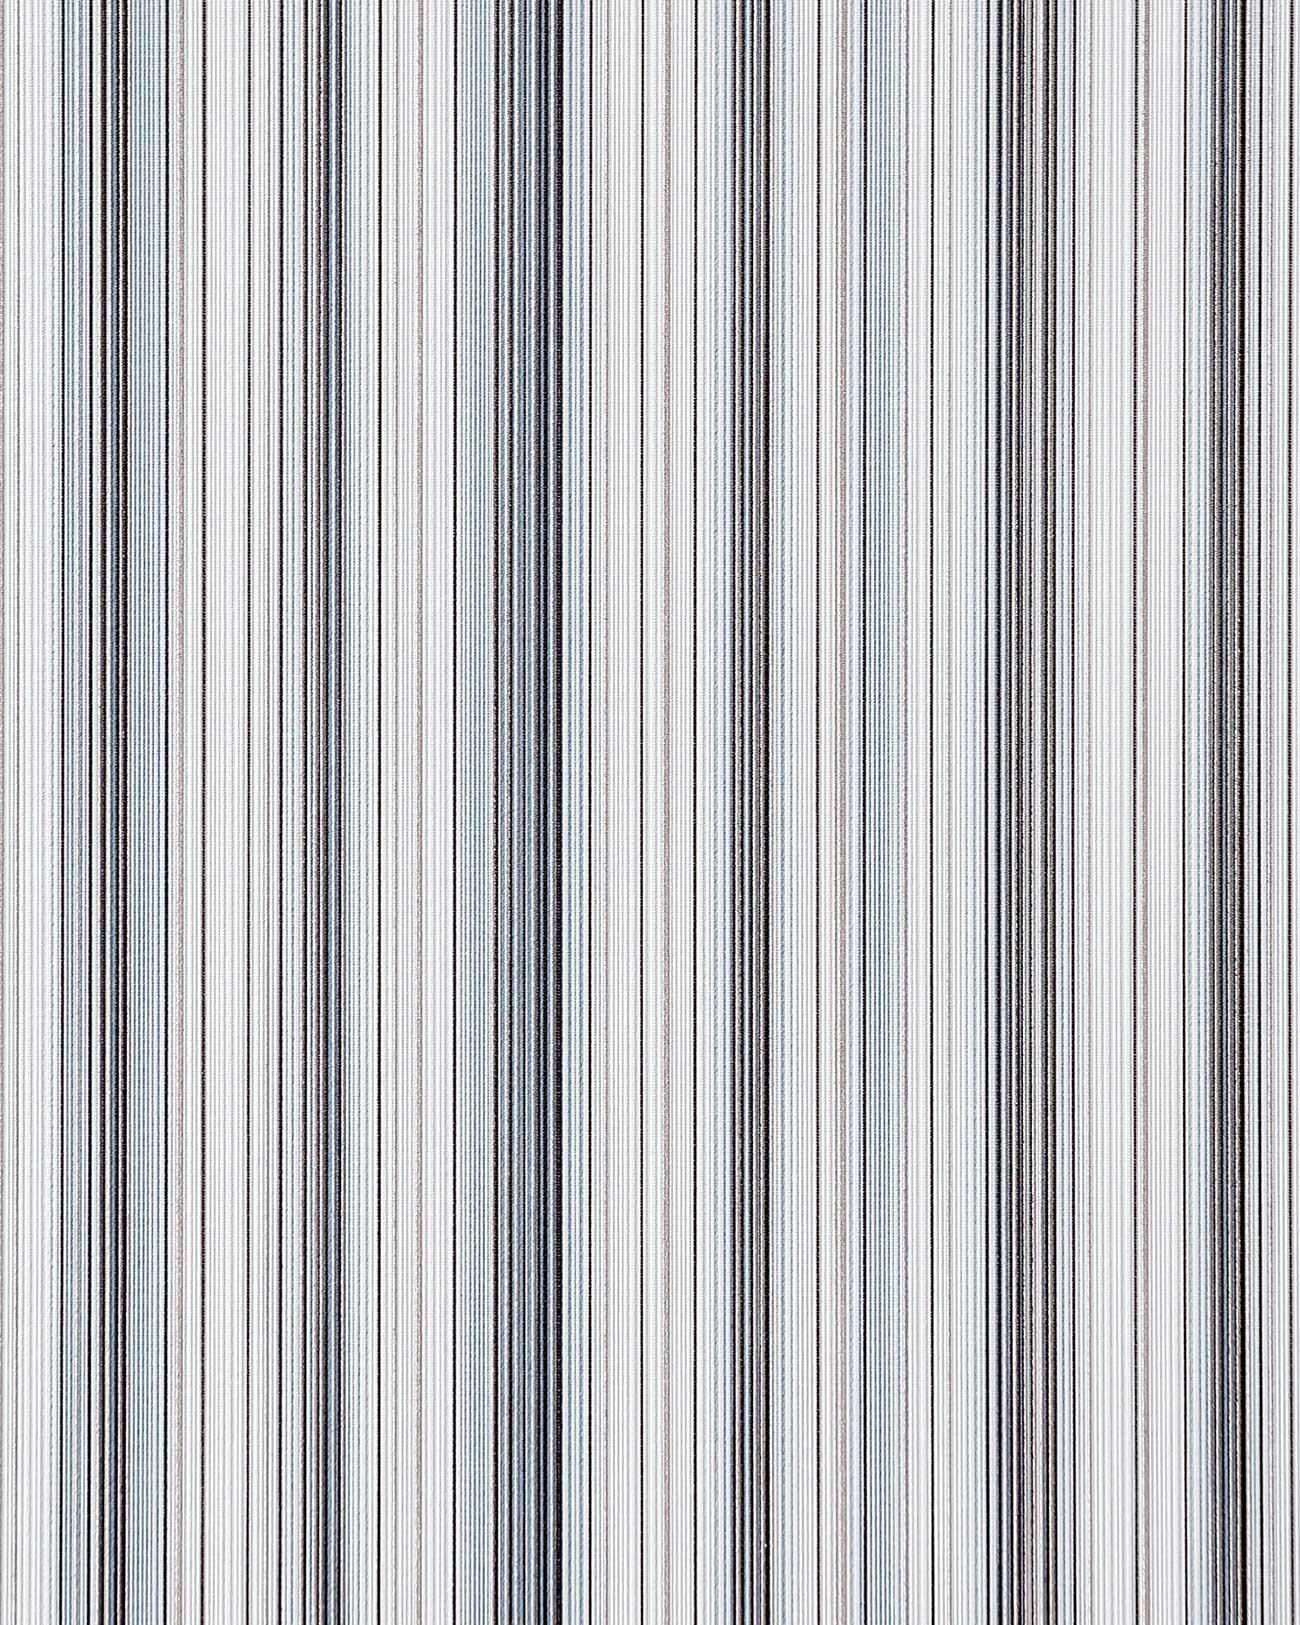 Wallcovering vinyl stripes wallpaper wall EDEM 097 26 sumptuous